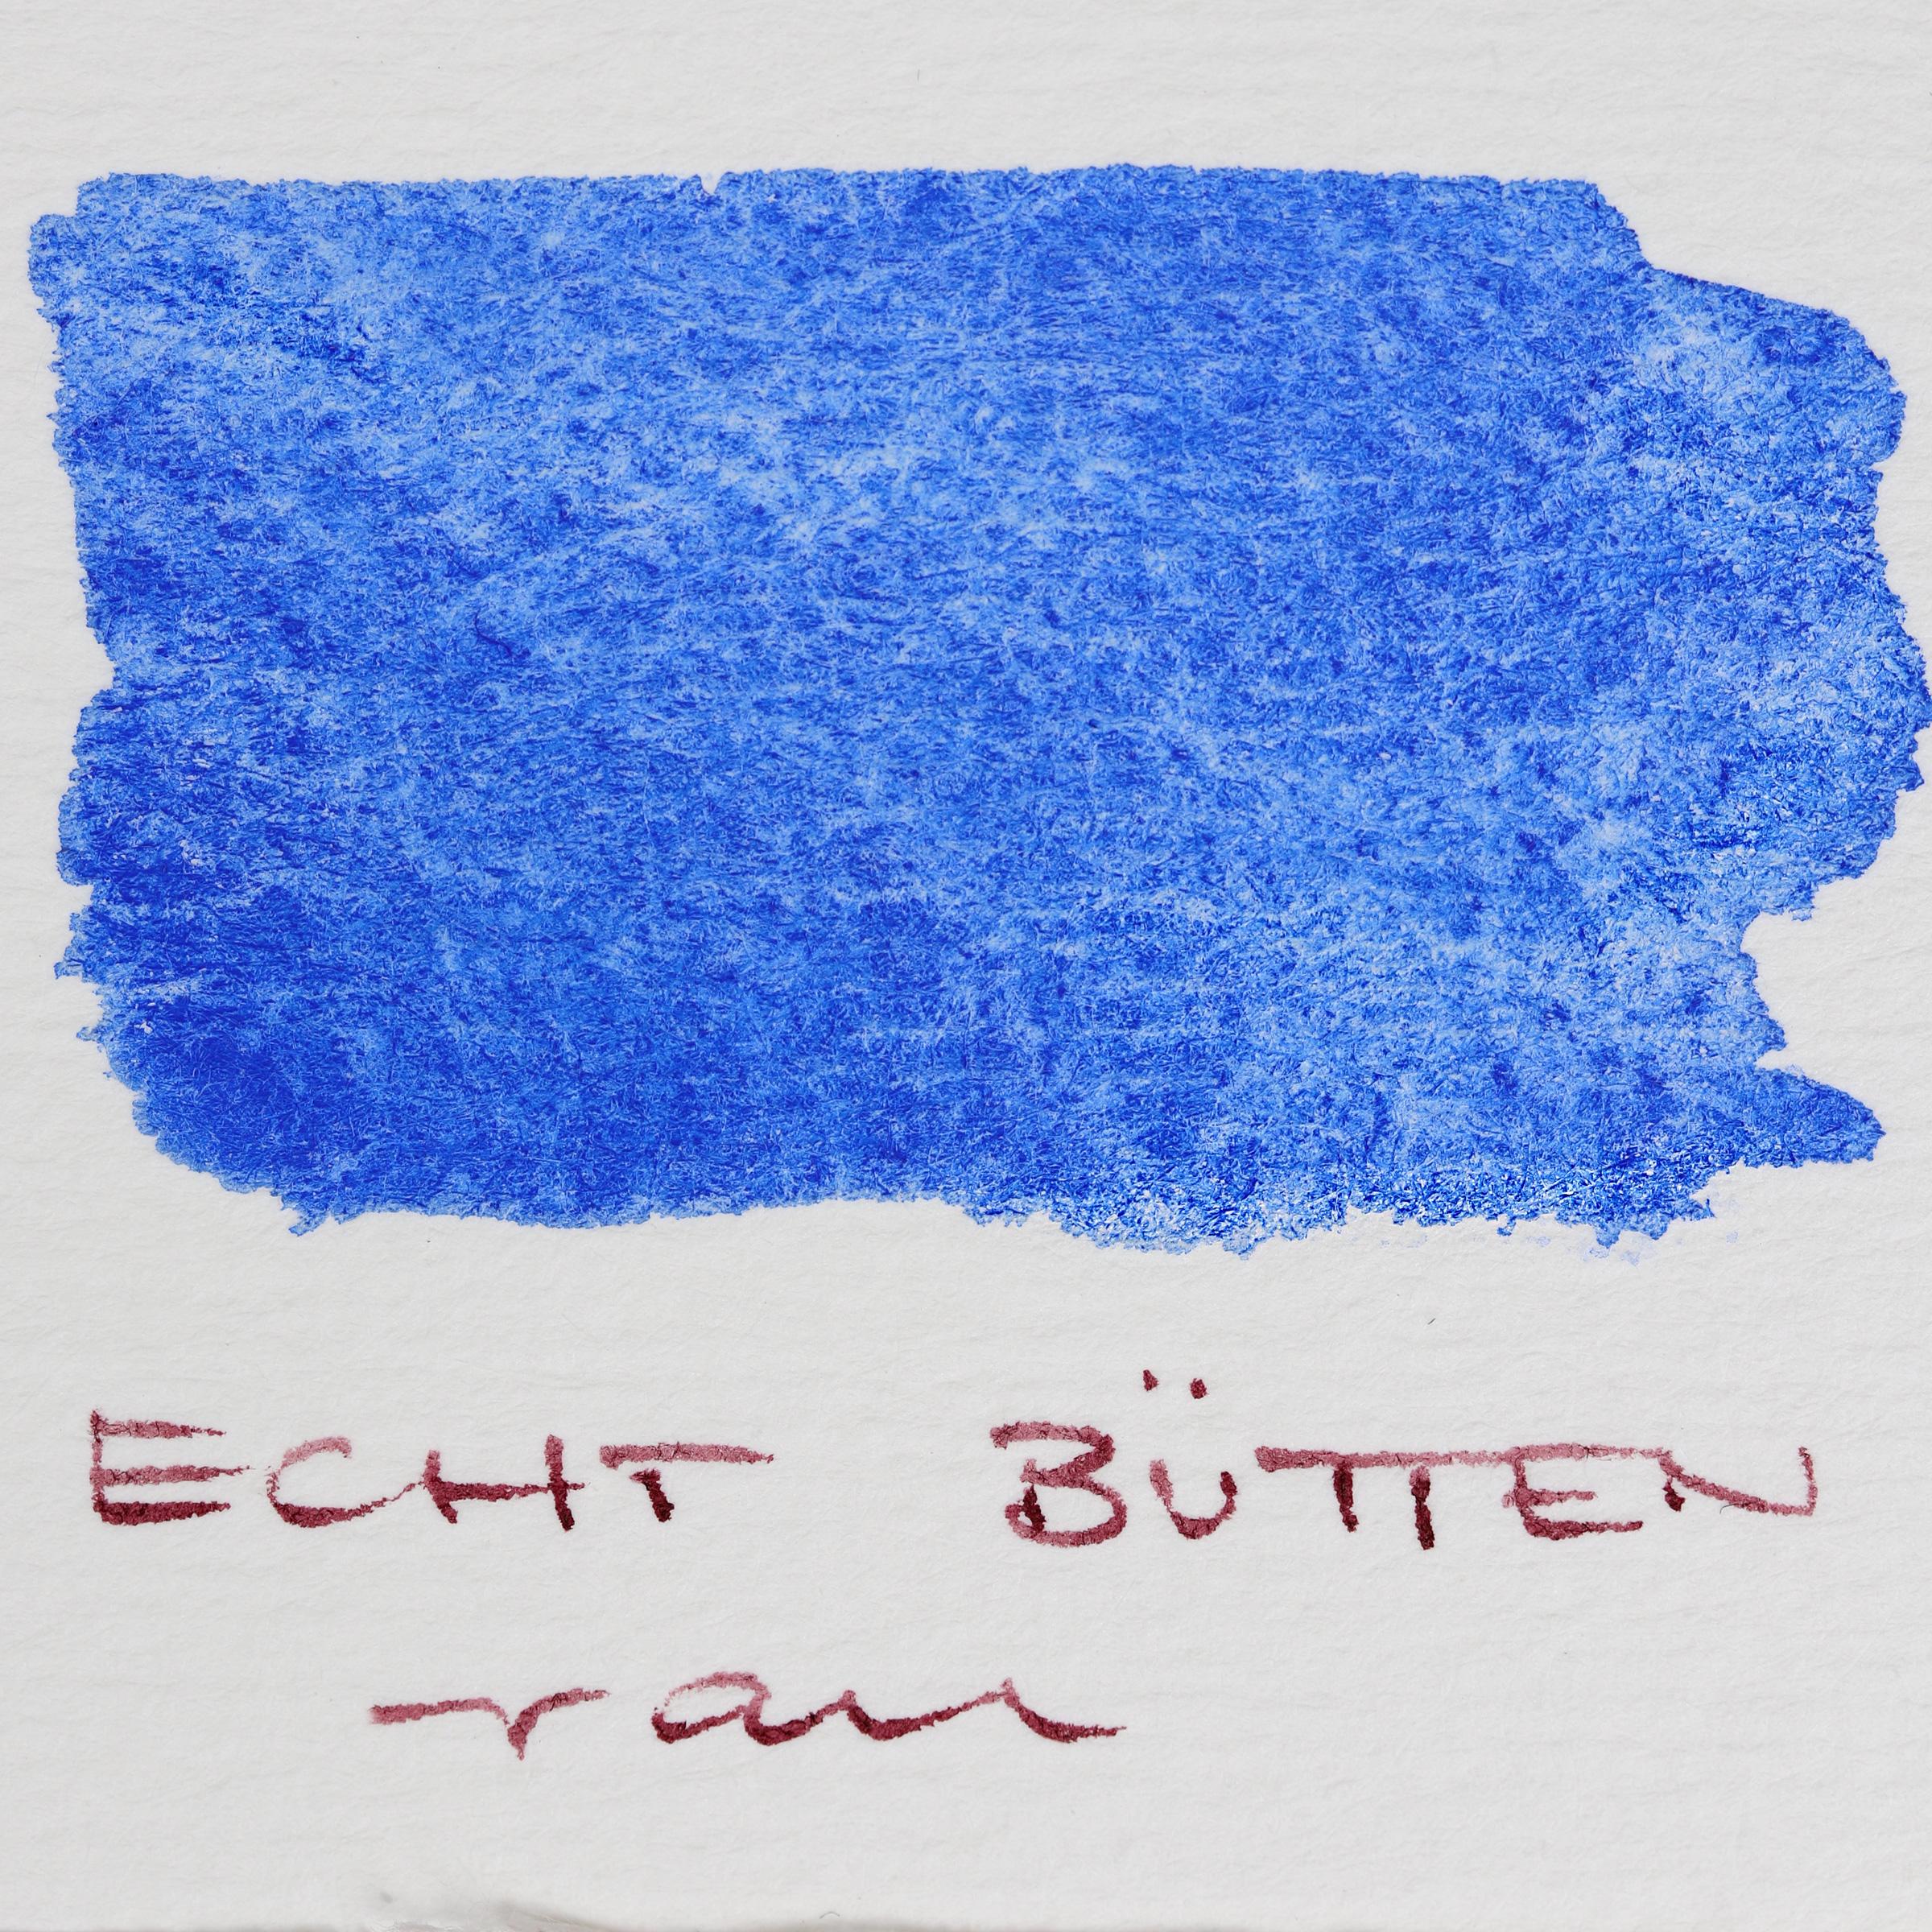 Granulierende Aquarellfarbe – Schmincke Französisch Ultramarin Blau (493) auf Echt-Bütten Papier, rau.